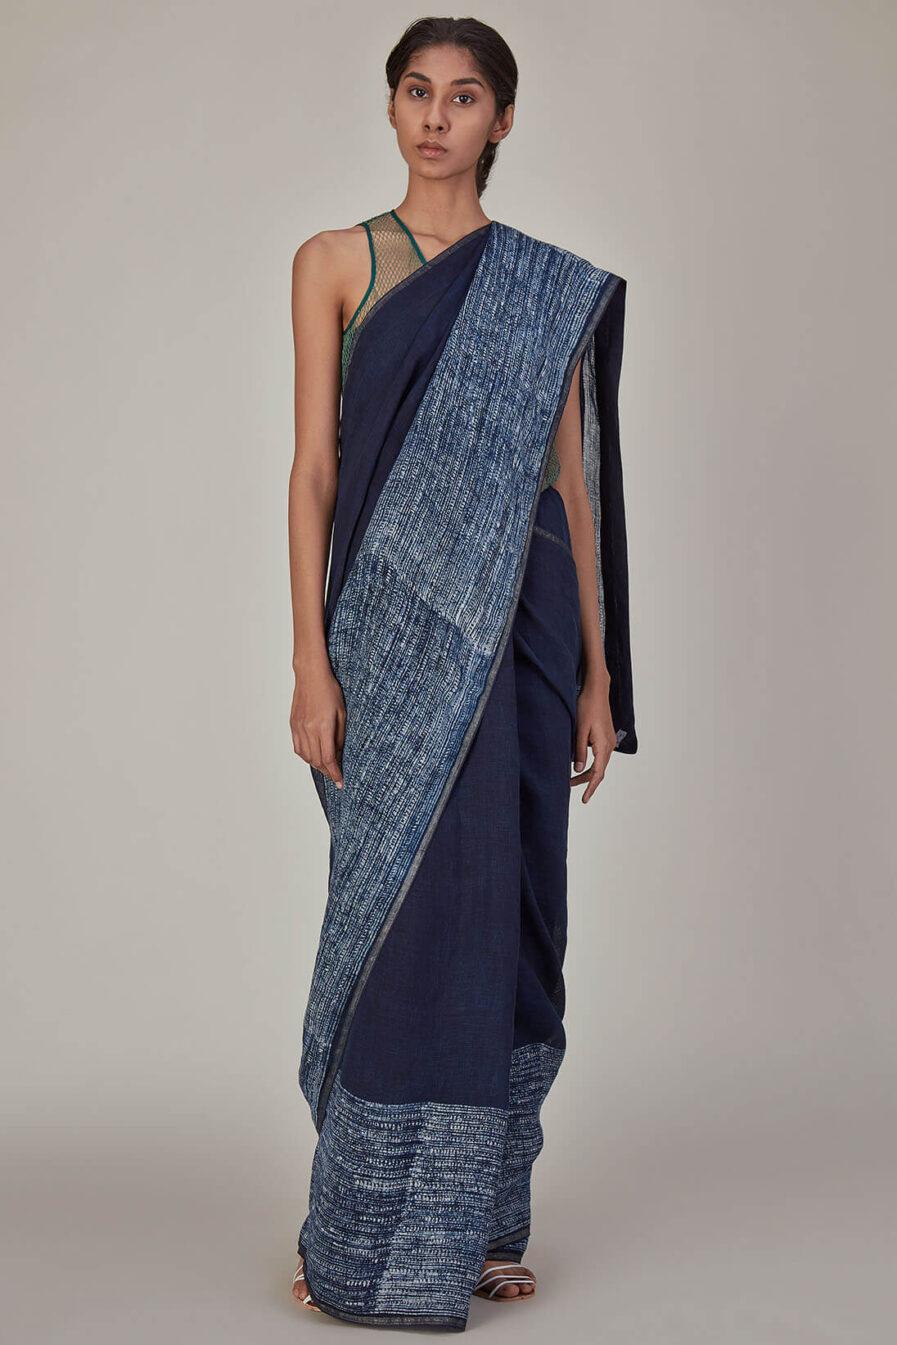 Anavila Sapa Indigo Batik Linen Sari